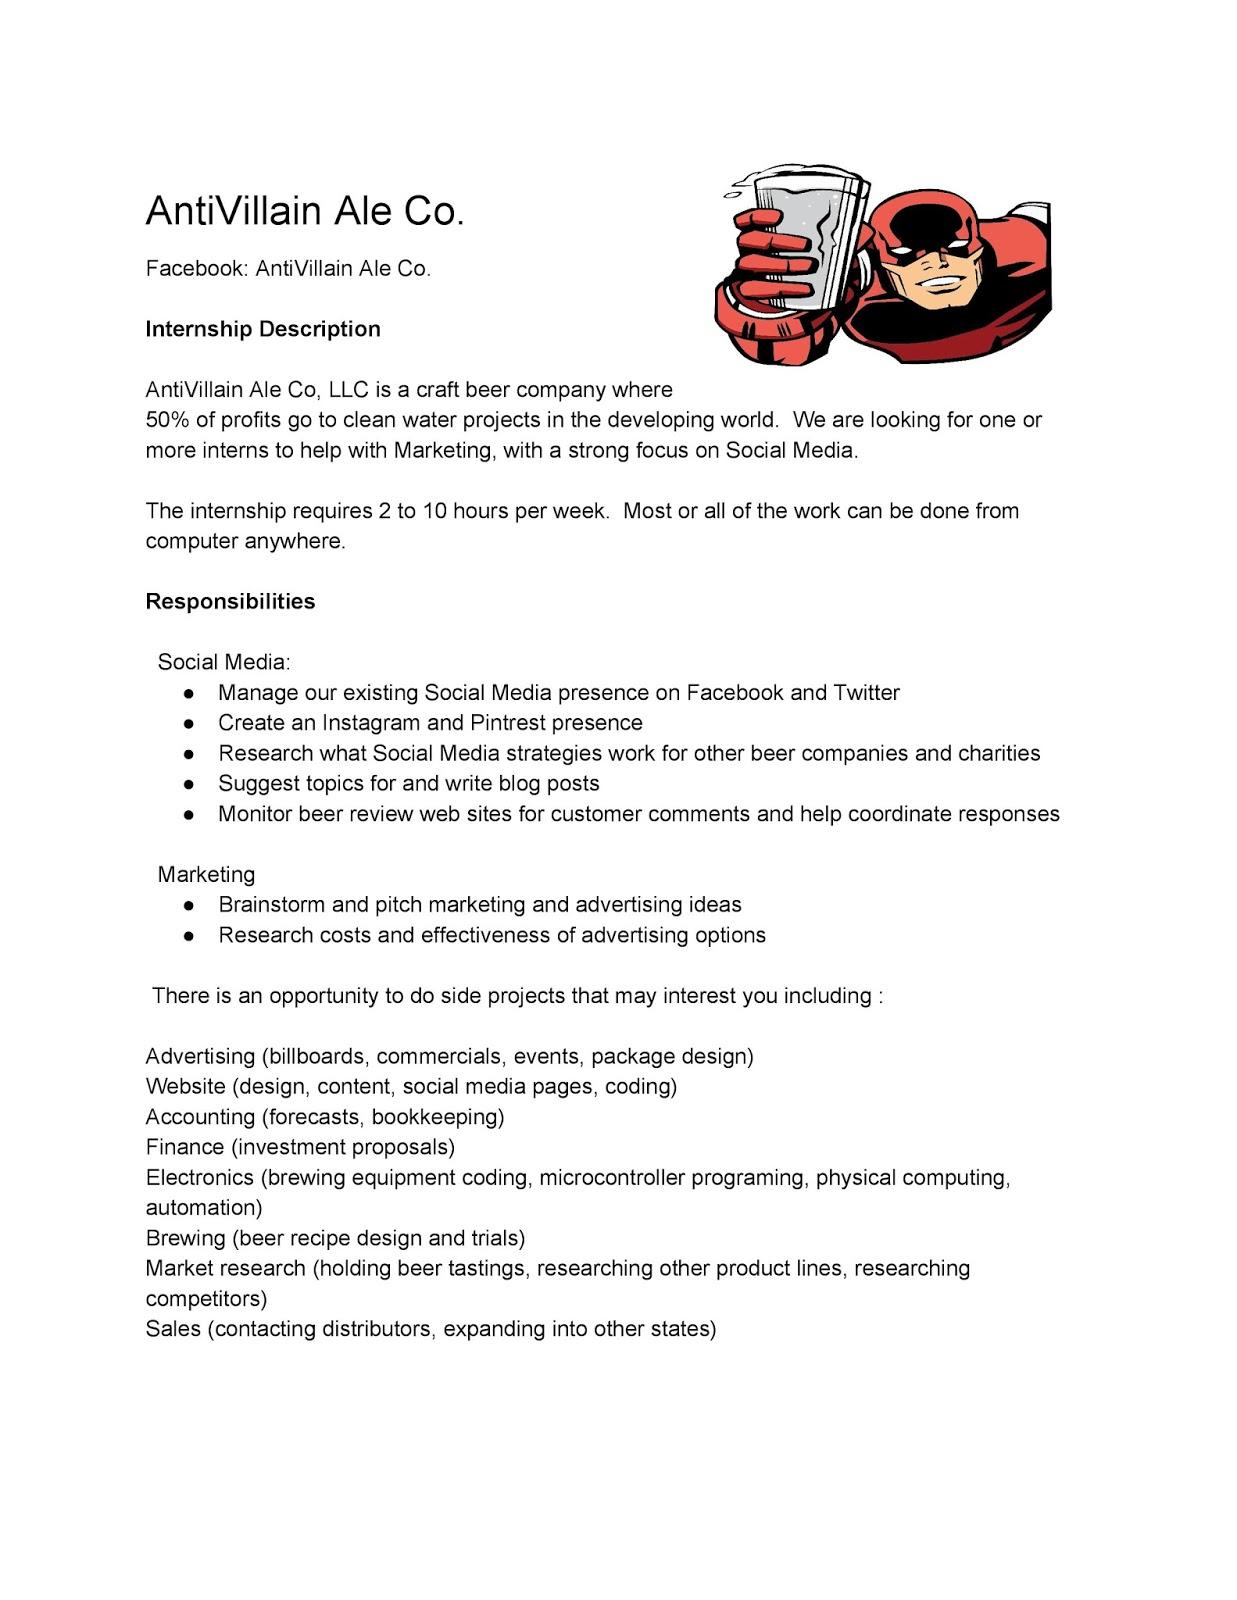 Antivillain Ale Co - Marketing Internship